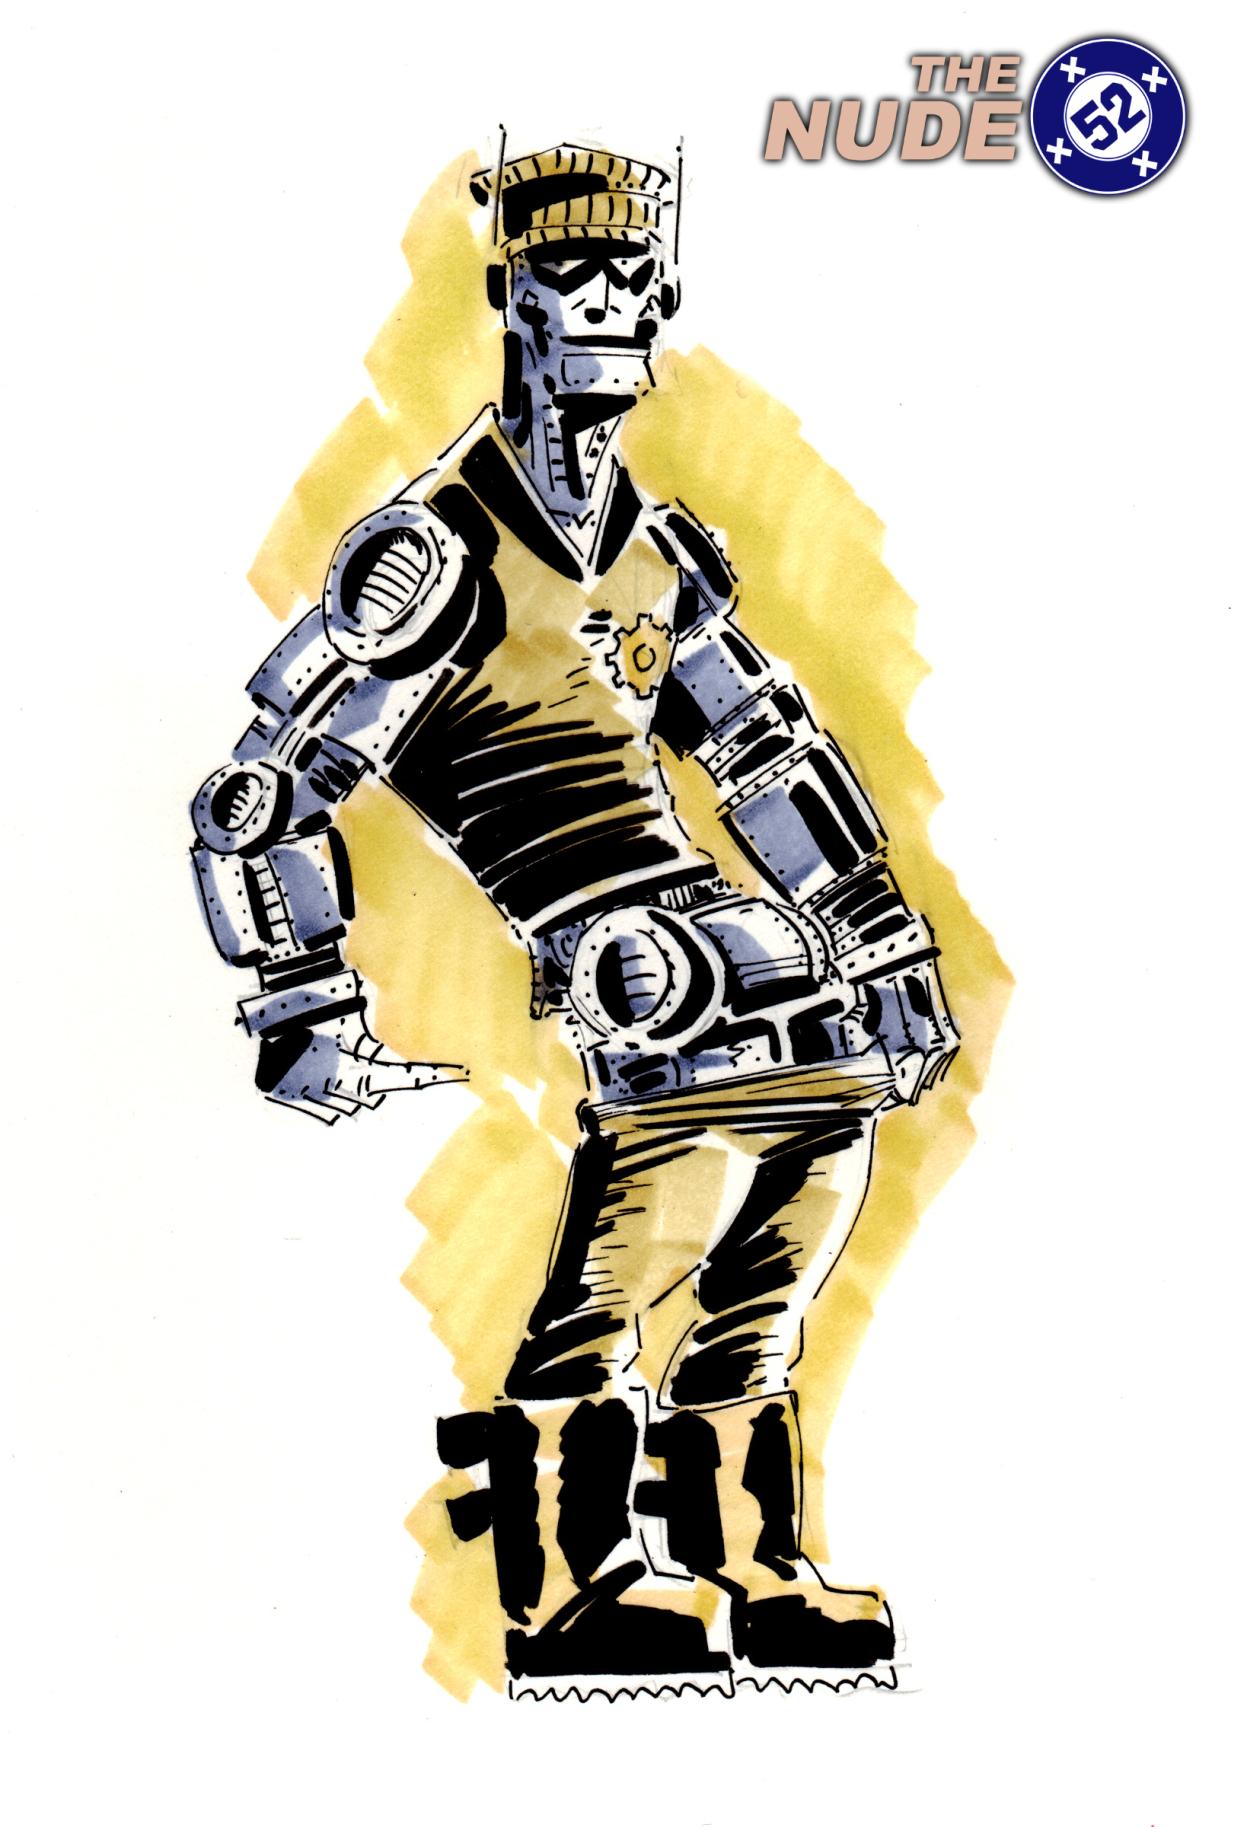 Nude 52 Robotman